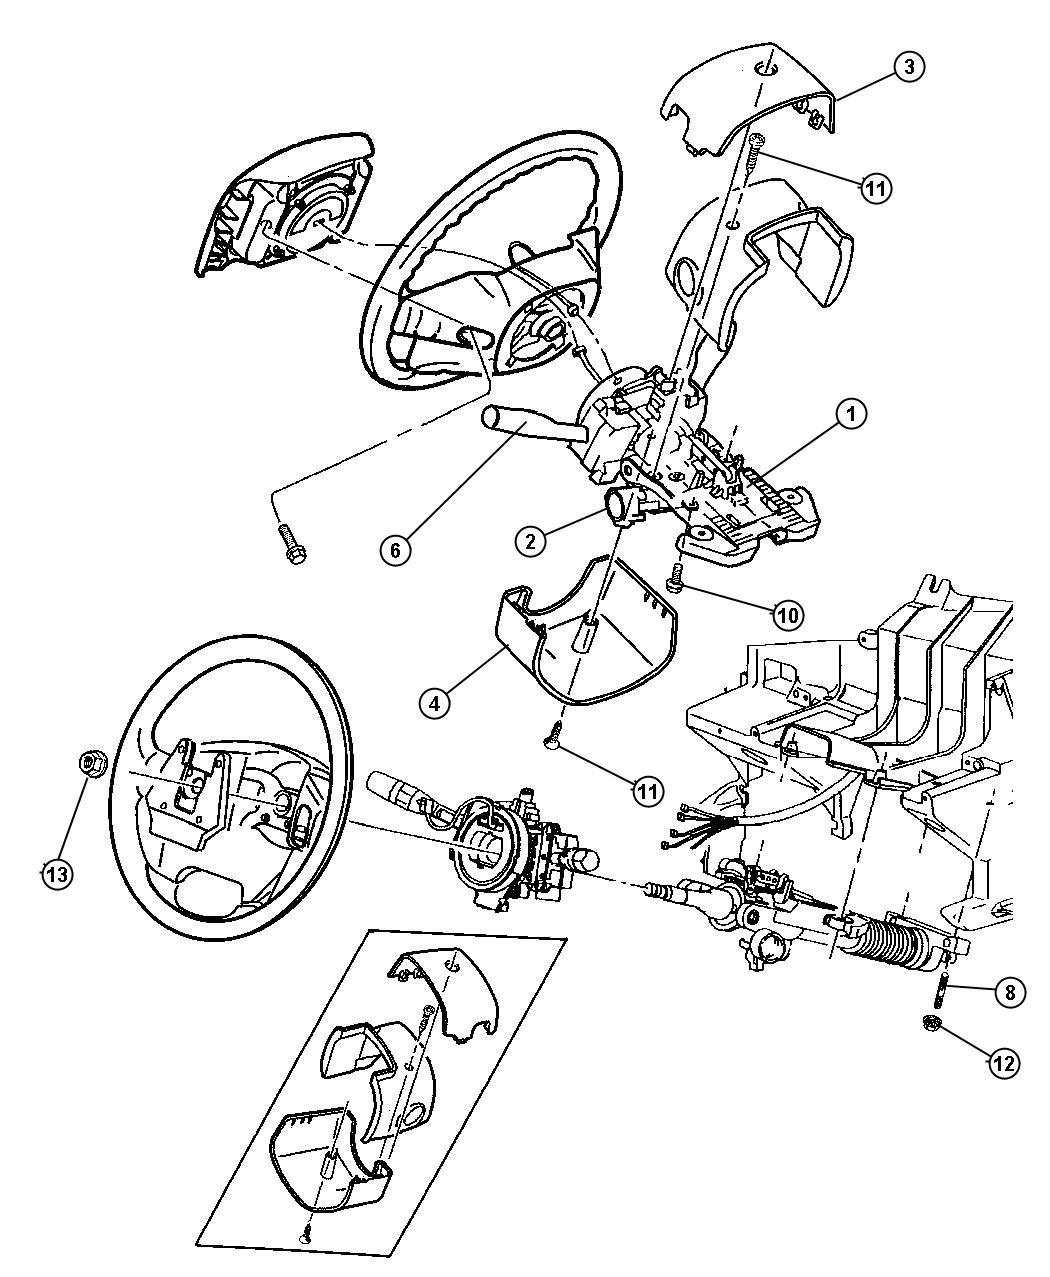 hight resolution of pontiac g8 transmission diagram pontiac free engine 2006 pontiac g8 2008 pontiac g6